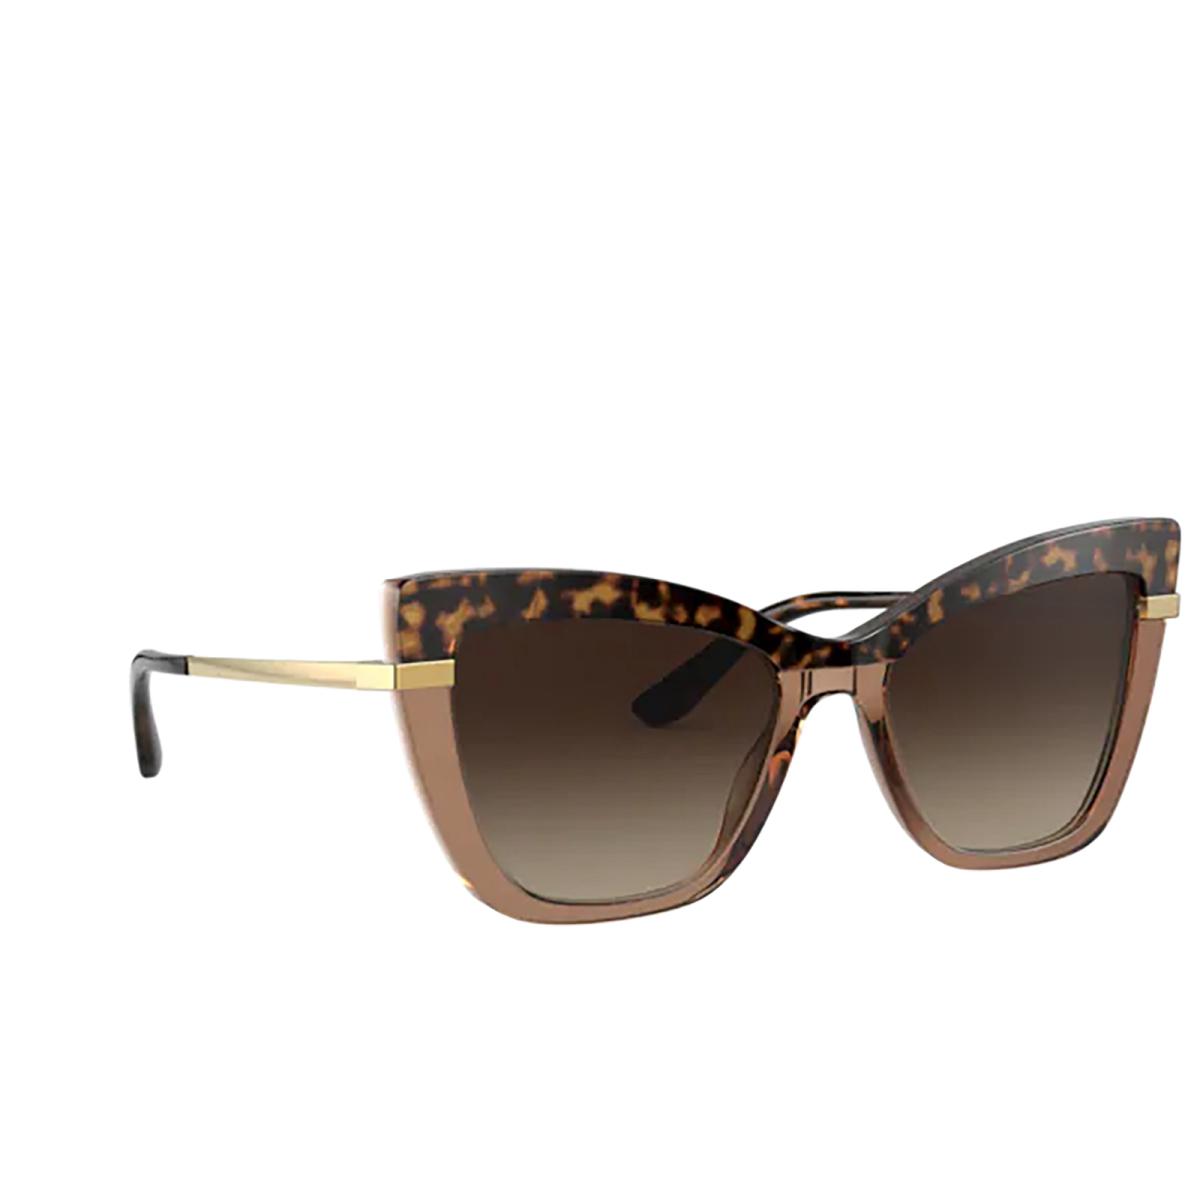 Dolce & Gabbana® Cat-eye Sunglasses: DG4374 color Havana On Transparent Brown 325613.